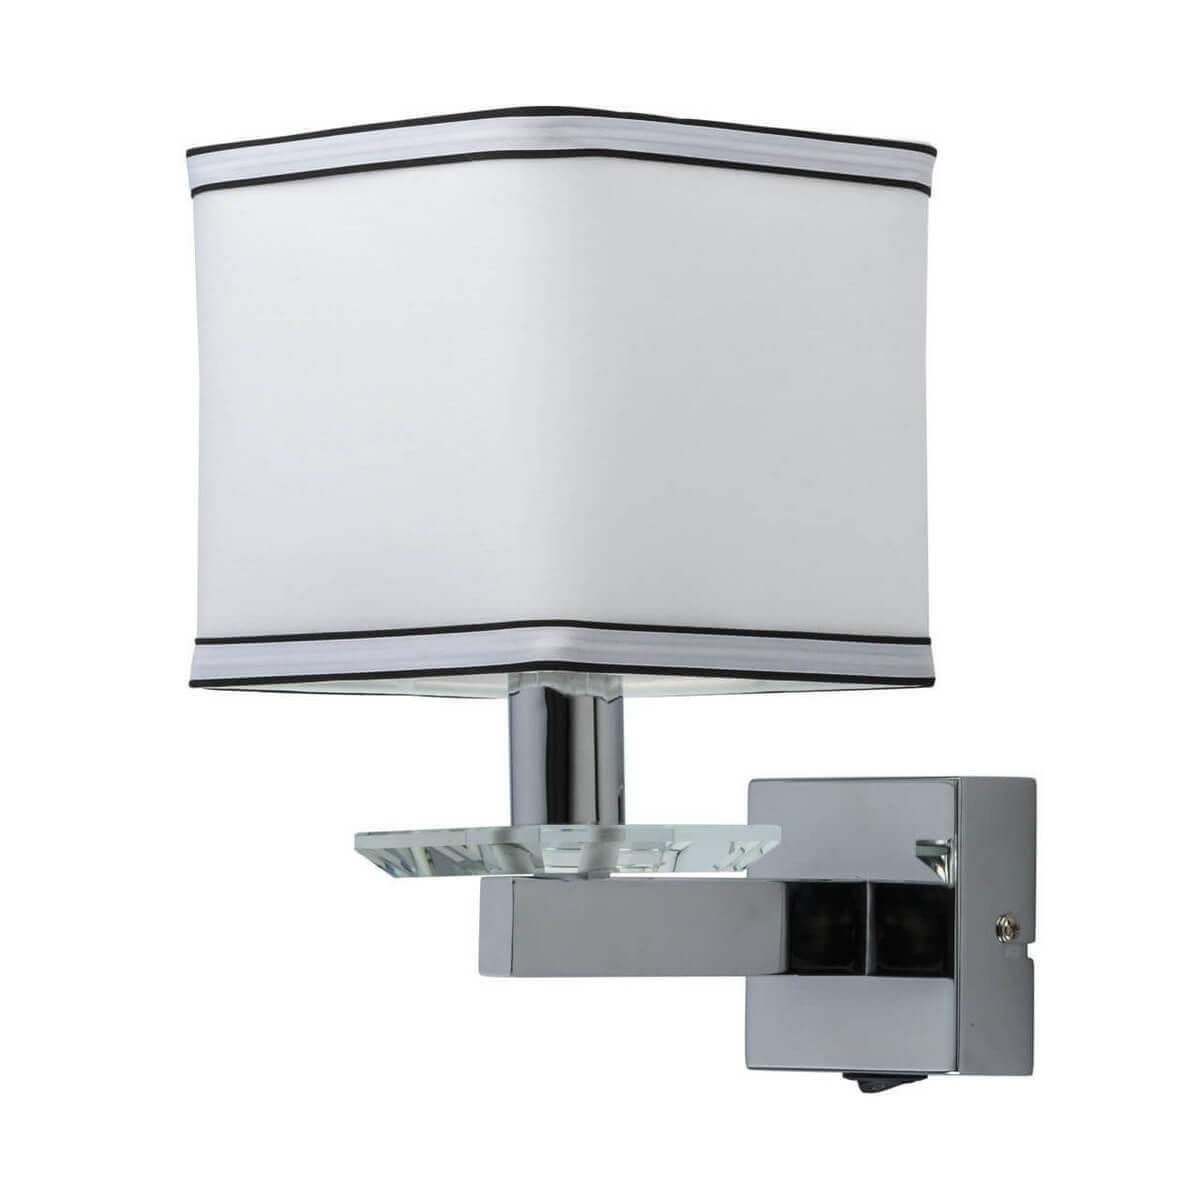 Бра MW-Light 686020401 Наполи бра mw light 356025201 нежность